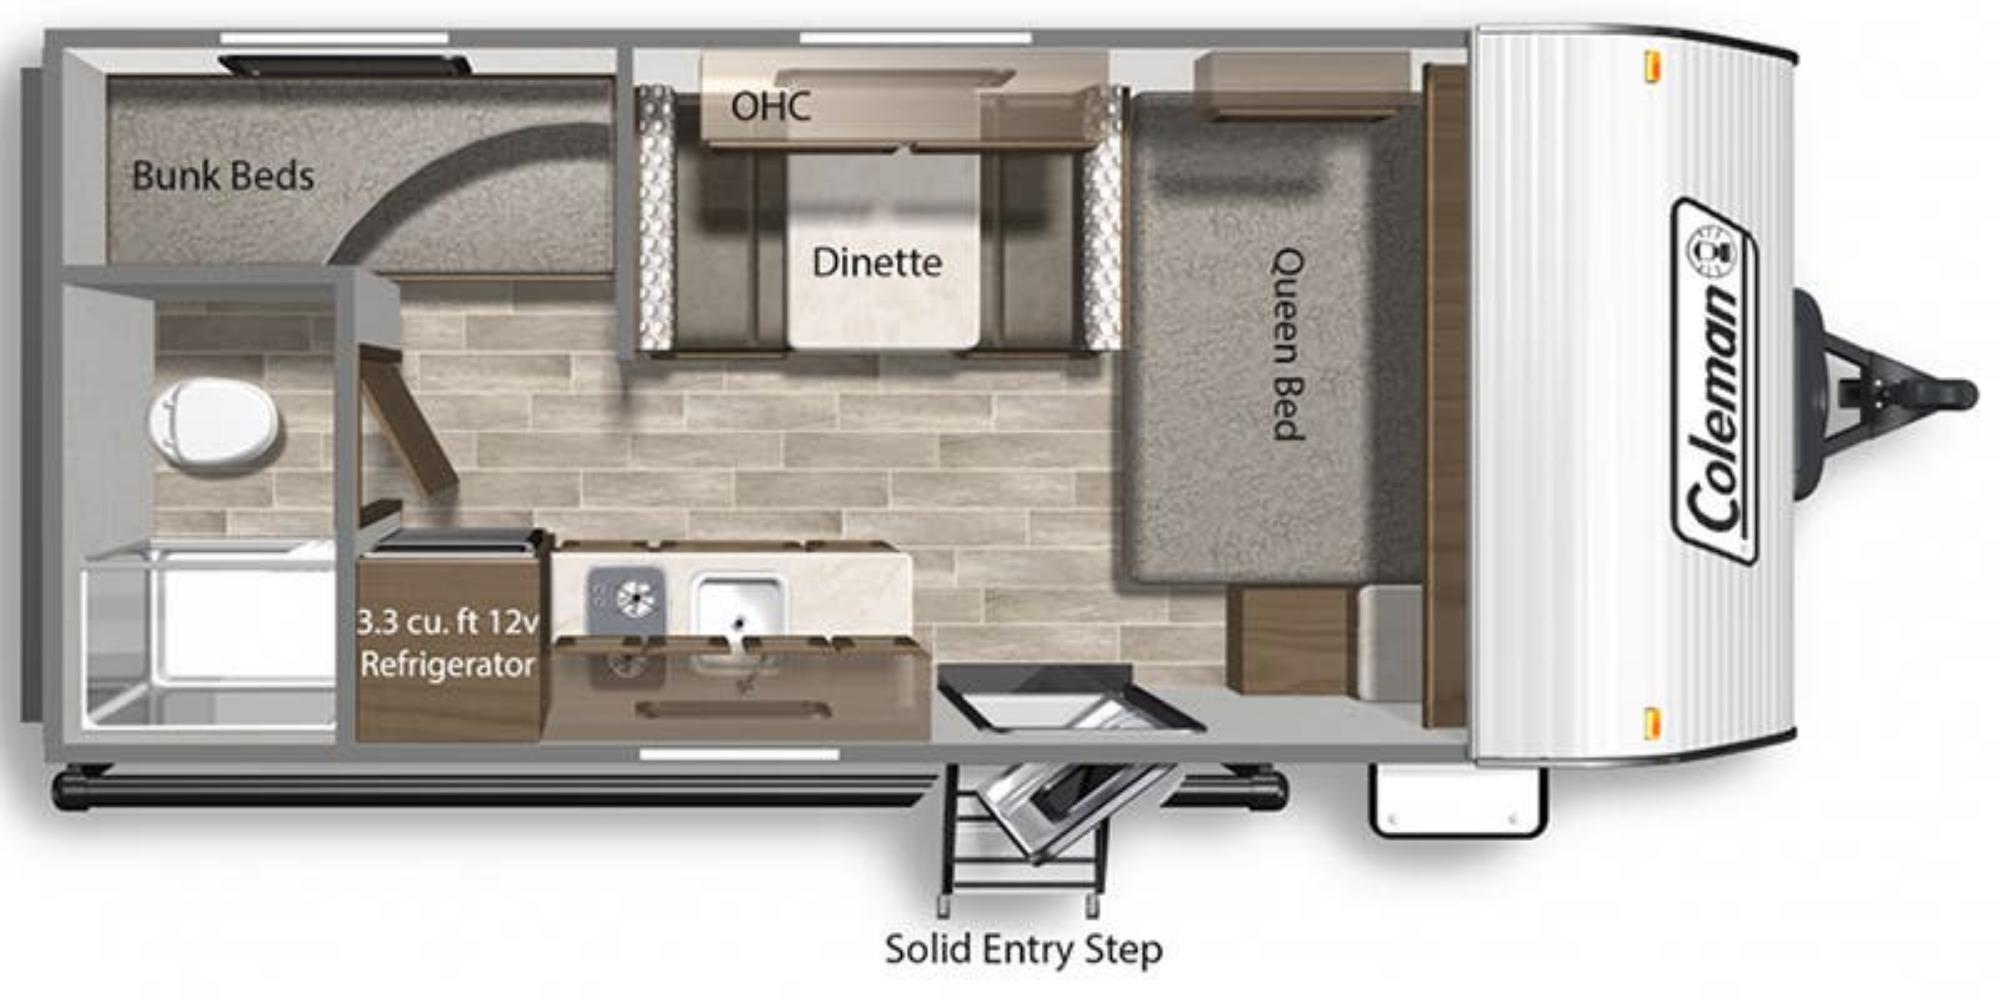 View Floor Plan for 2022 COLEMAN COLEMAN LANTERN LT 17B